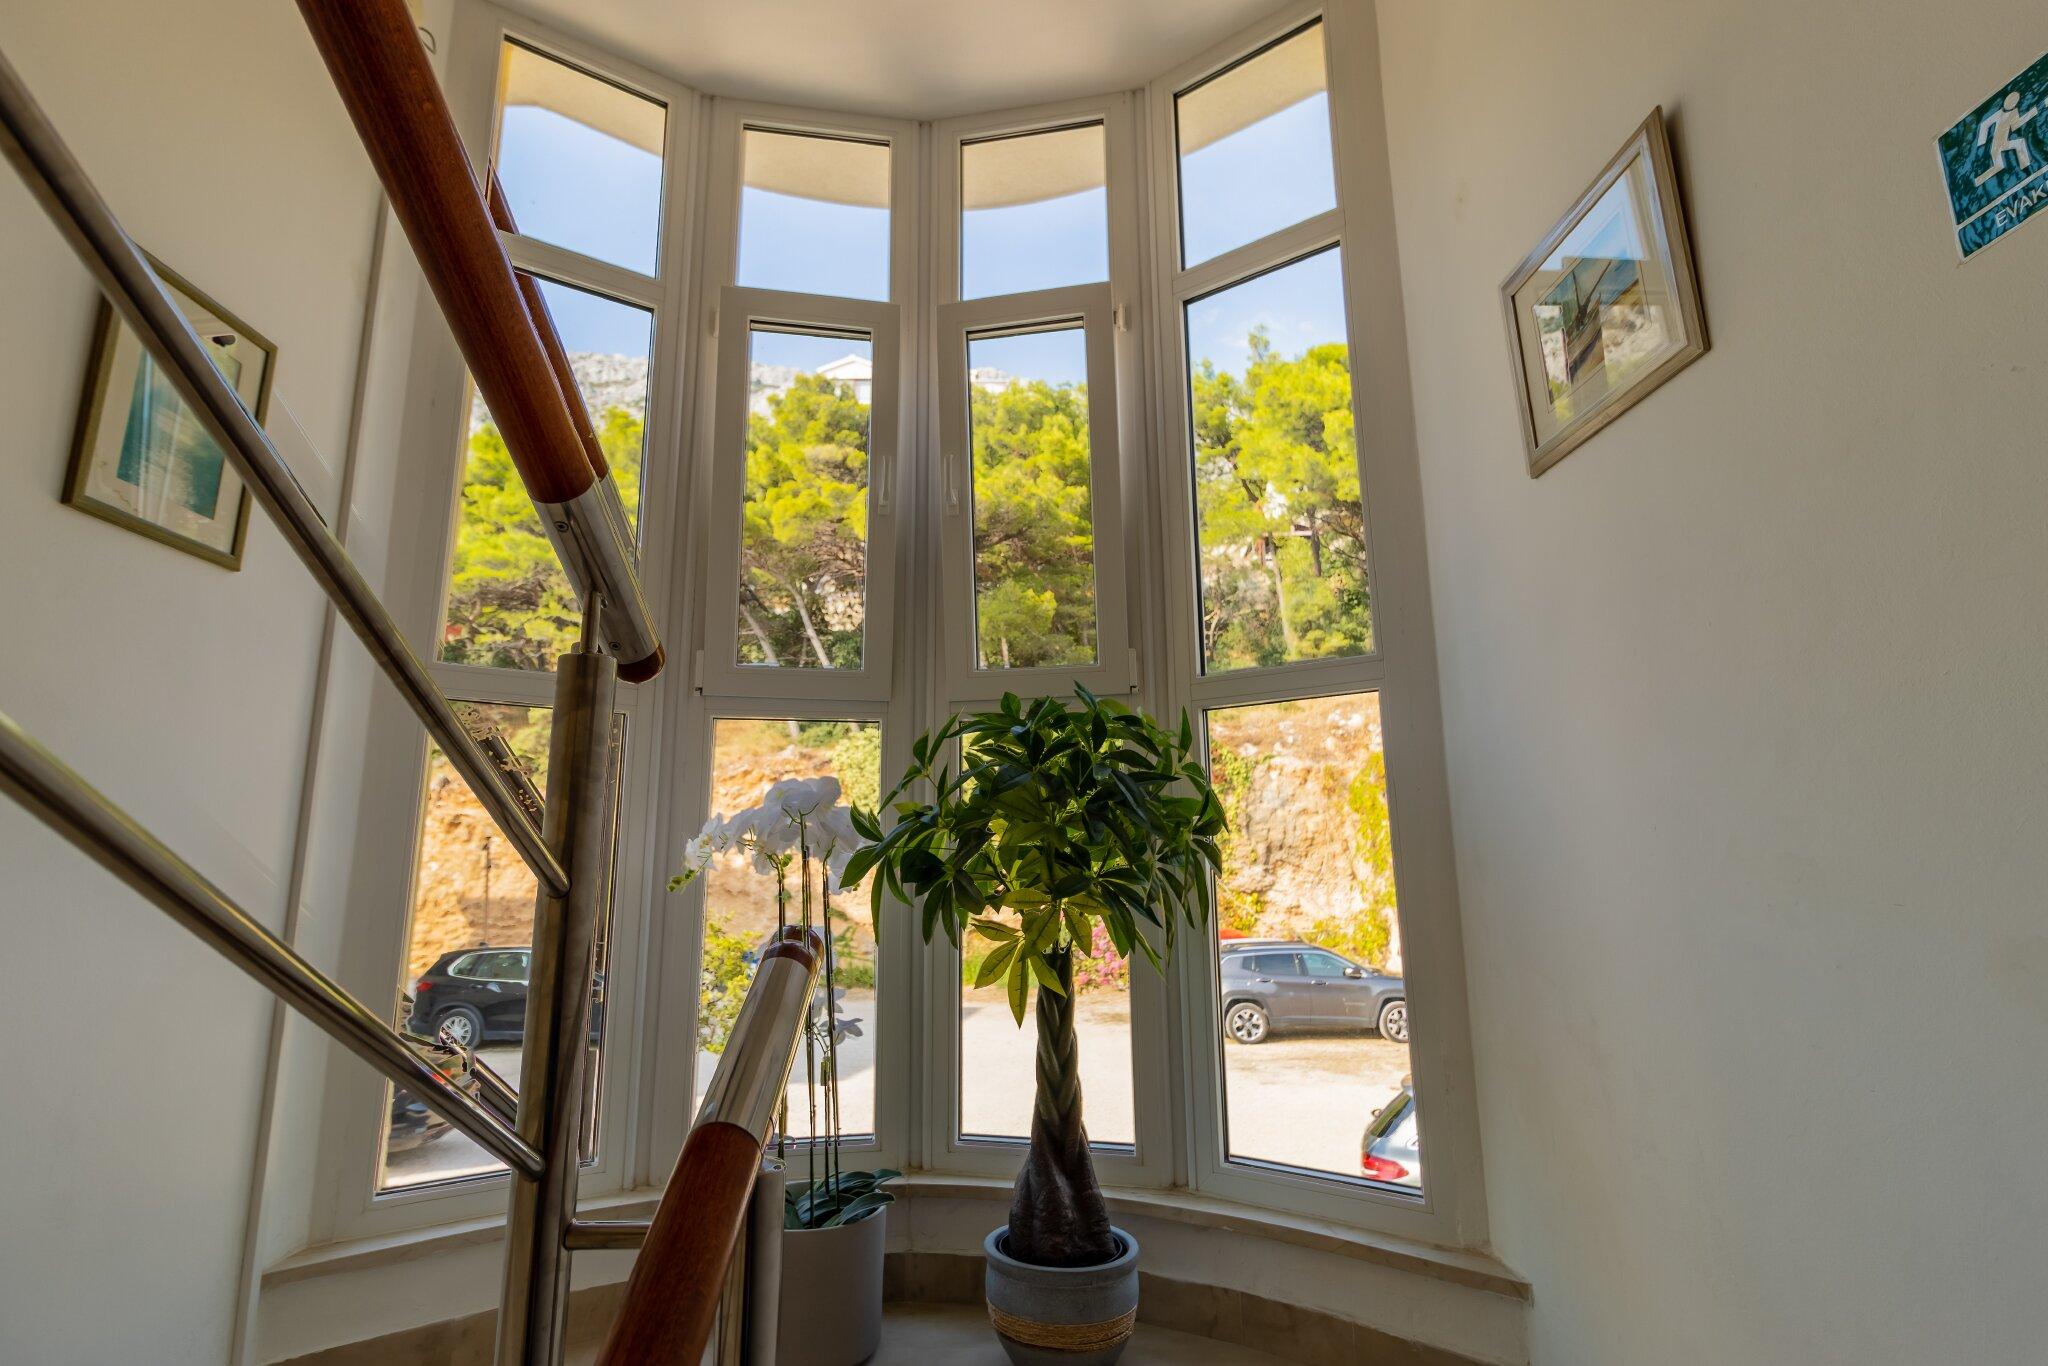 Sofa Ap. L, D (hohe EG)